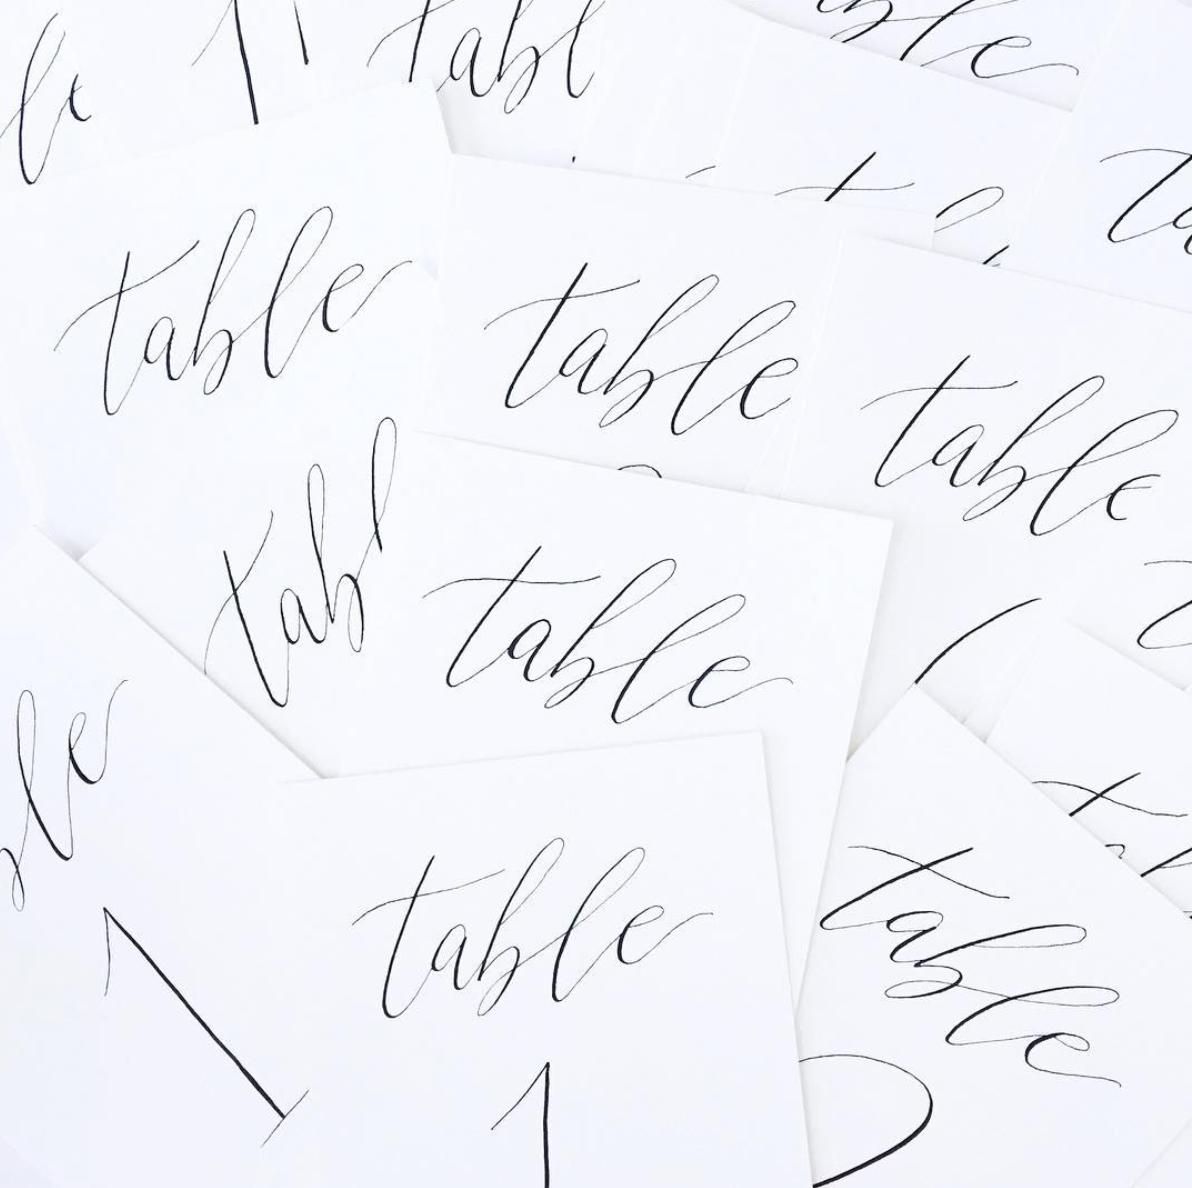 TableNumbers-Calligraphy-WeddingDetails-BirminghamAl.png